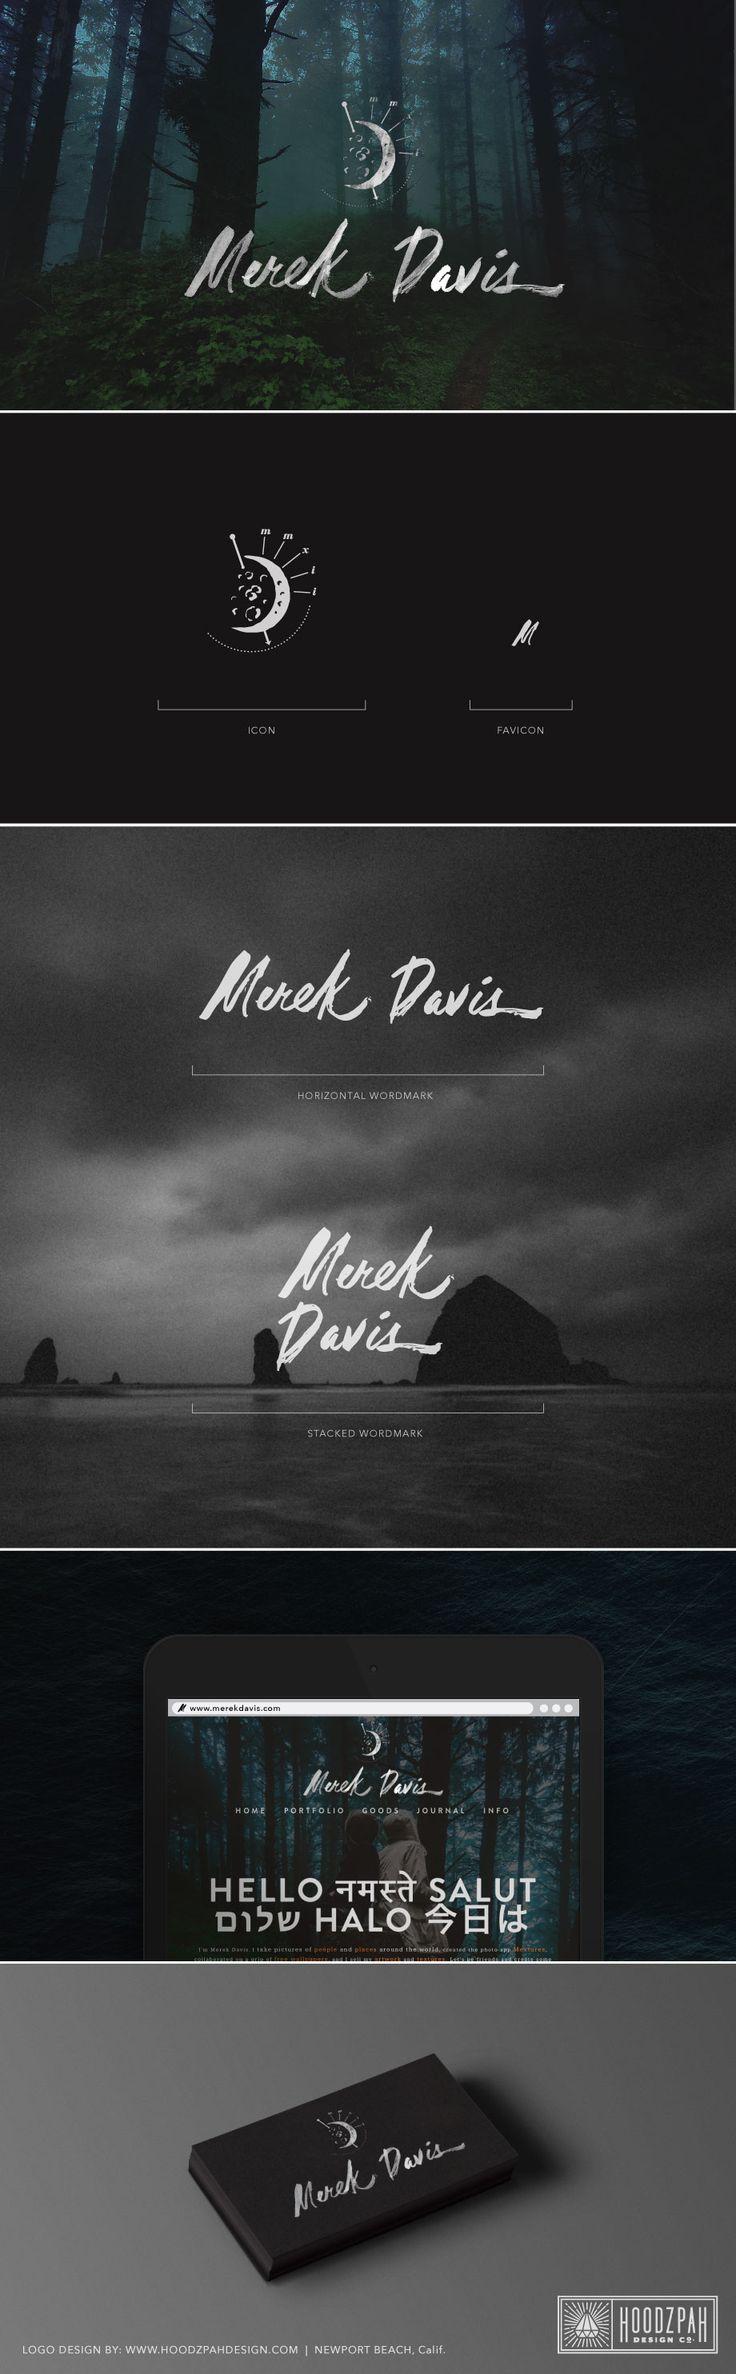 Merek Davis logo design by Amy Hood of Hoodzpah Design Co